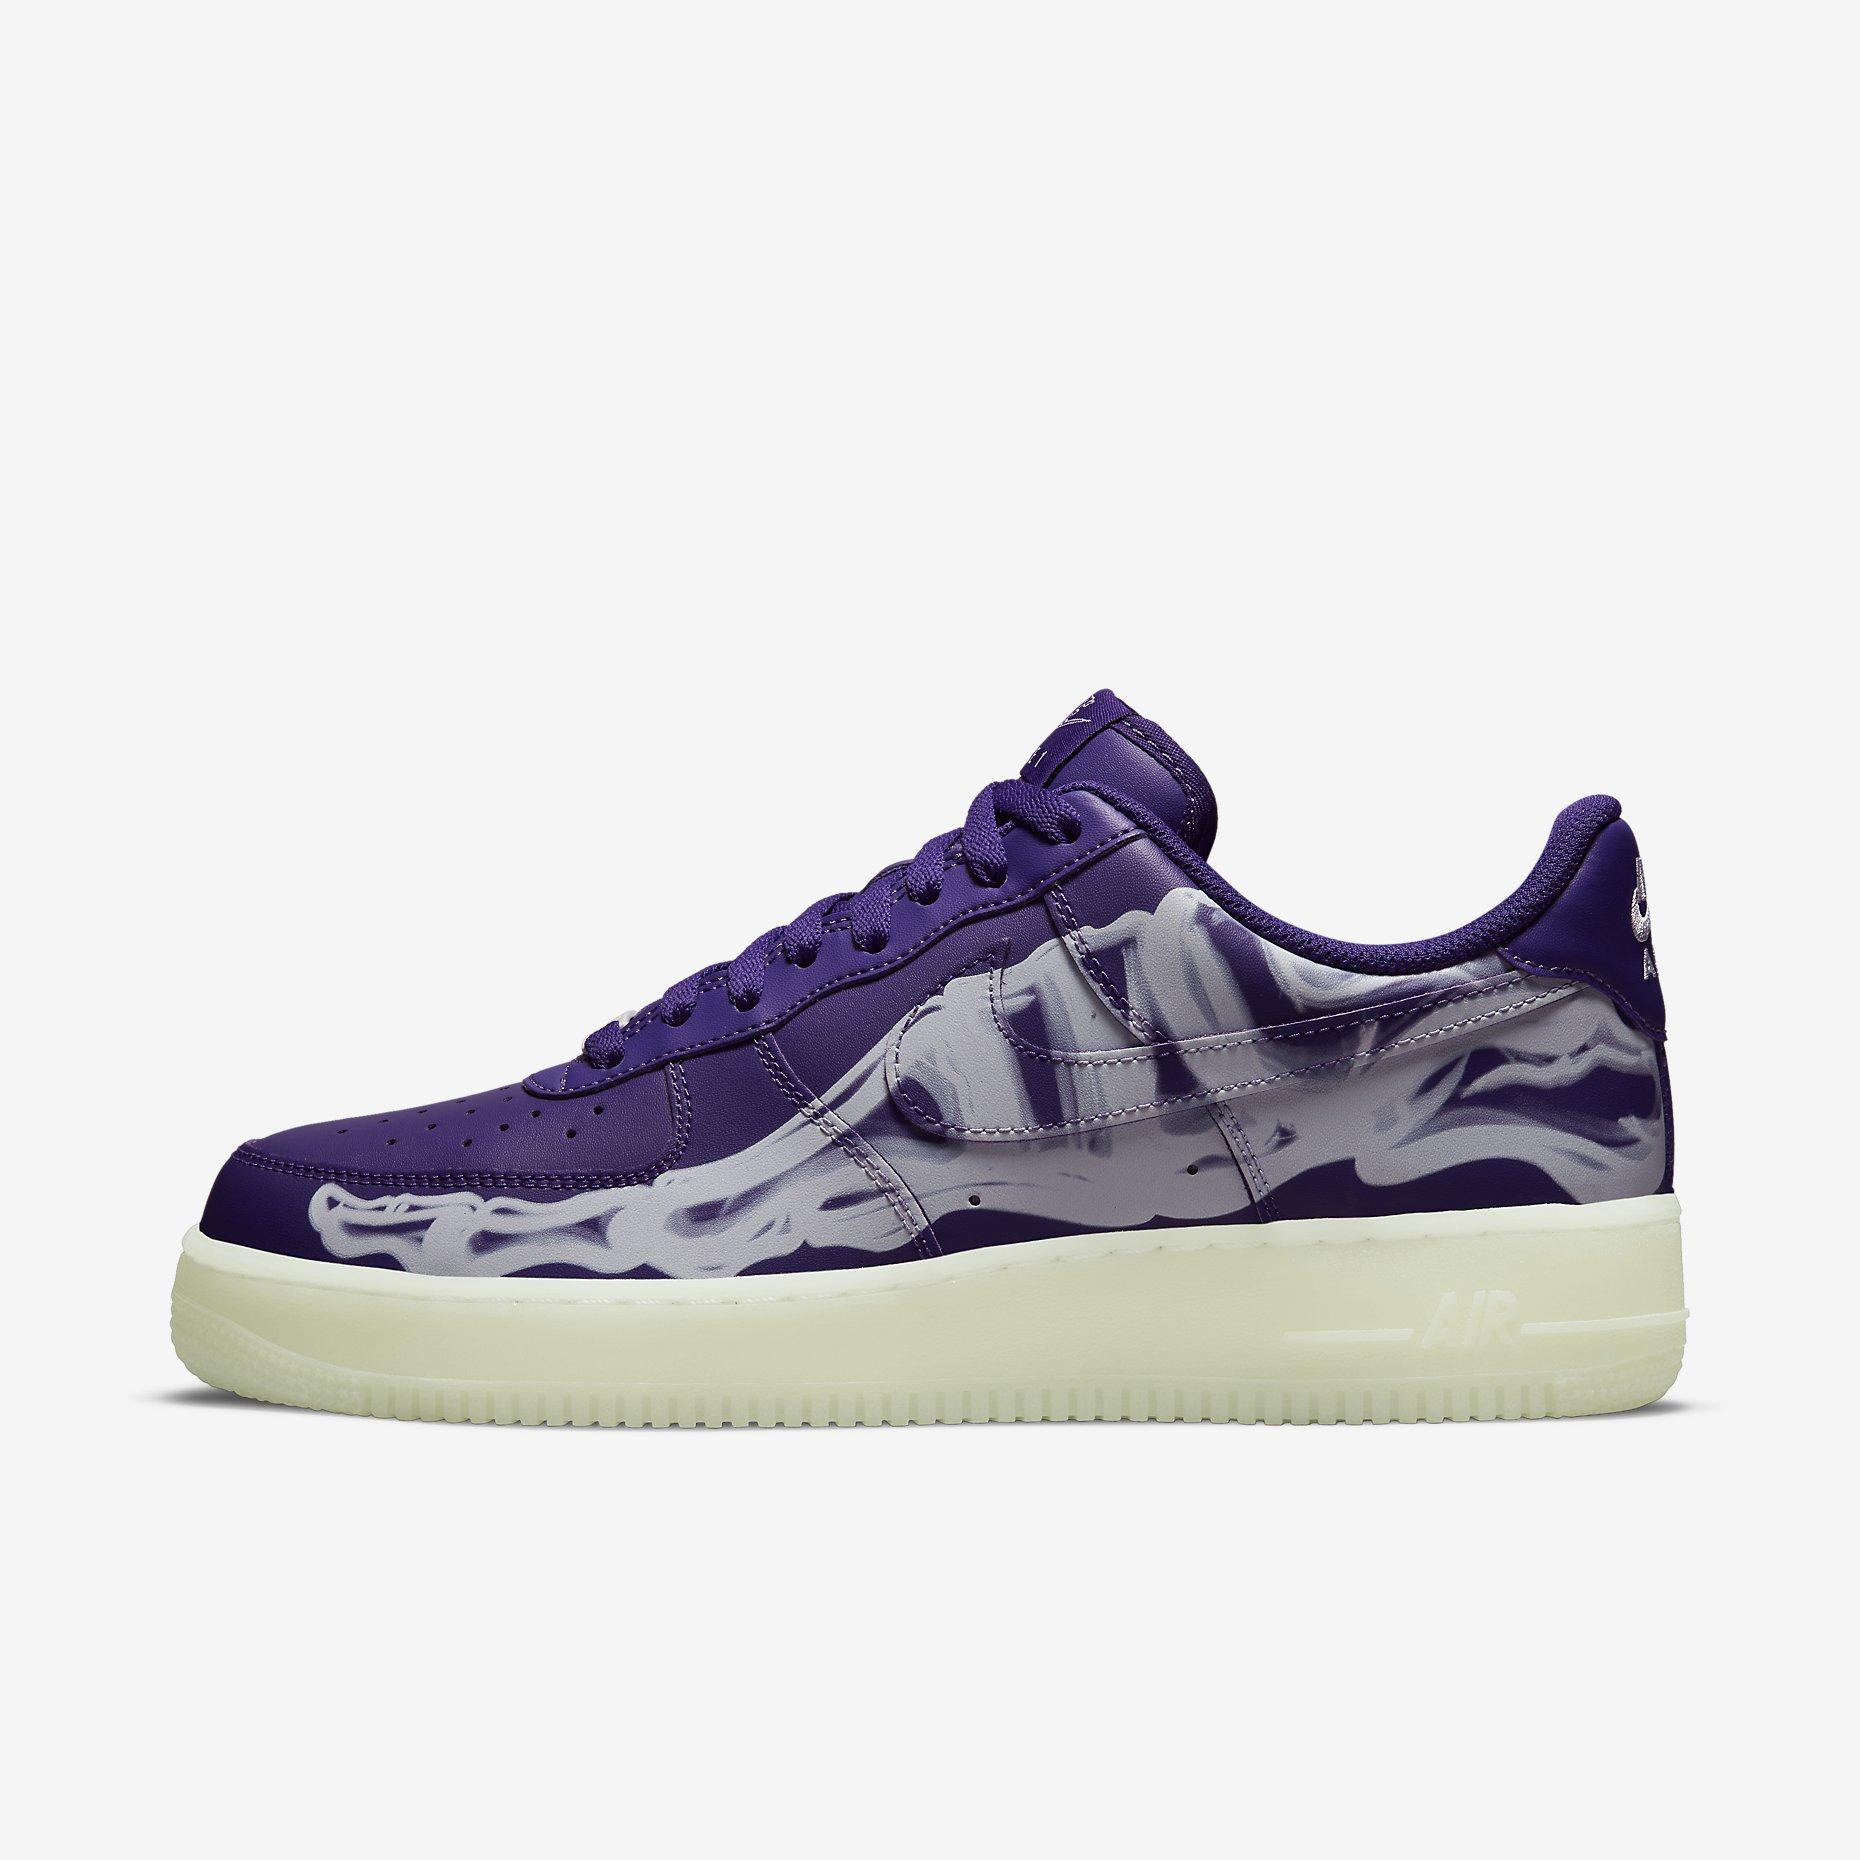 Nike Air Force 1 '07 Skeleton QS 'Court Purple'